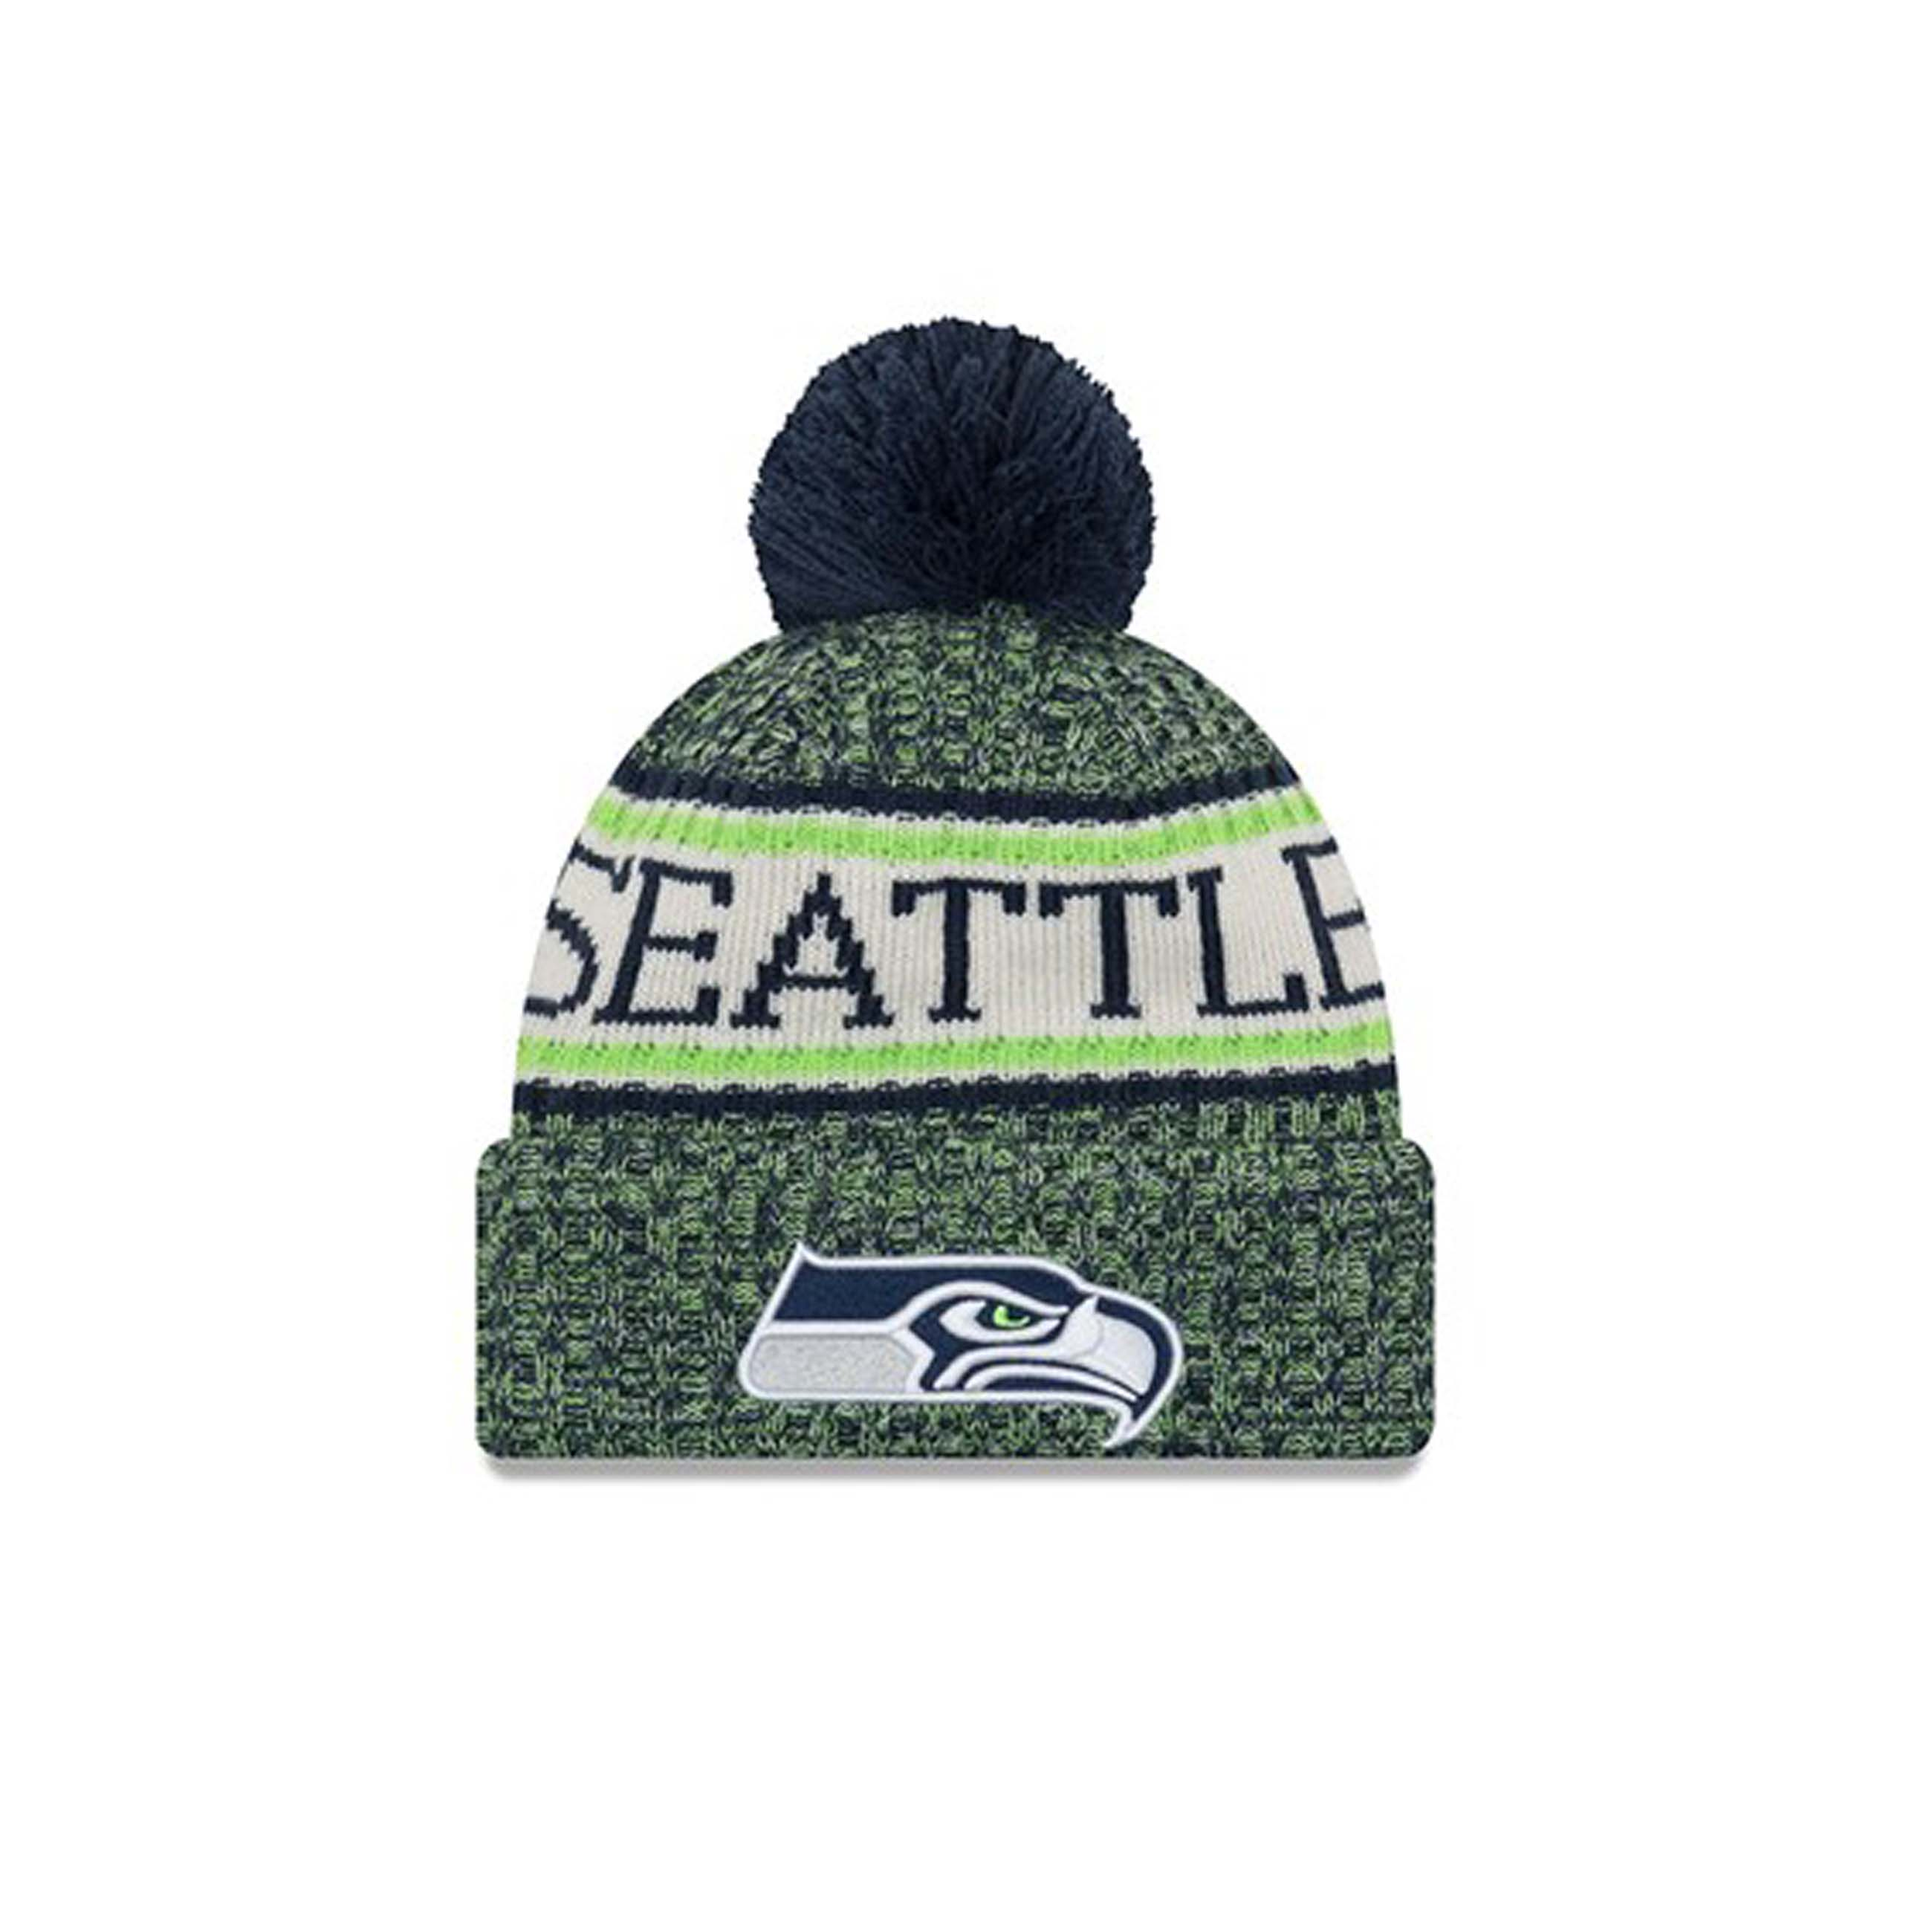 35057b67ad3e7e Details about New Era NFL Sideline Bobble Knit Home Seattle Seahawks Beanie  OTC OSFA